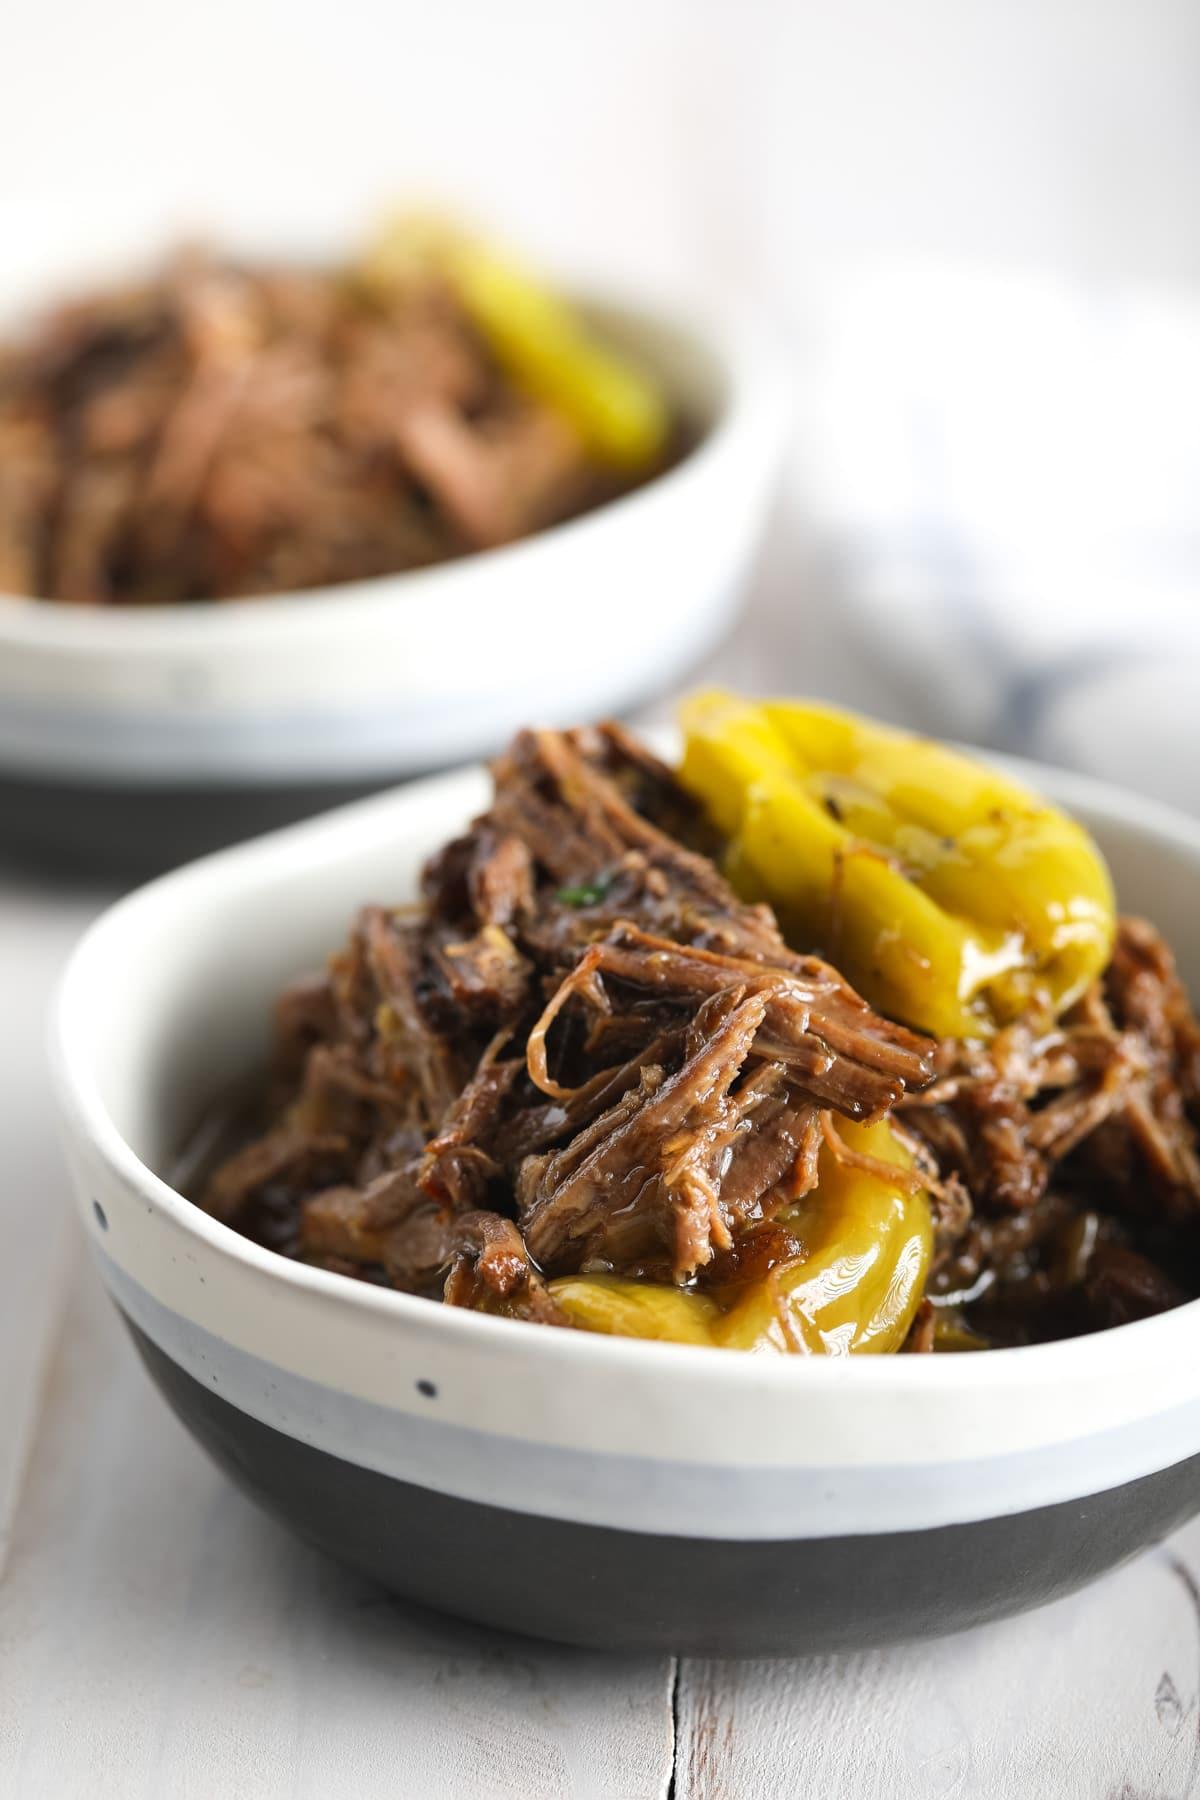 Paleo Instant Pot Italian Beef Recipe #ASpicyPerspective #pressurecooker #keto #lowcarb #paleo